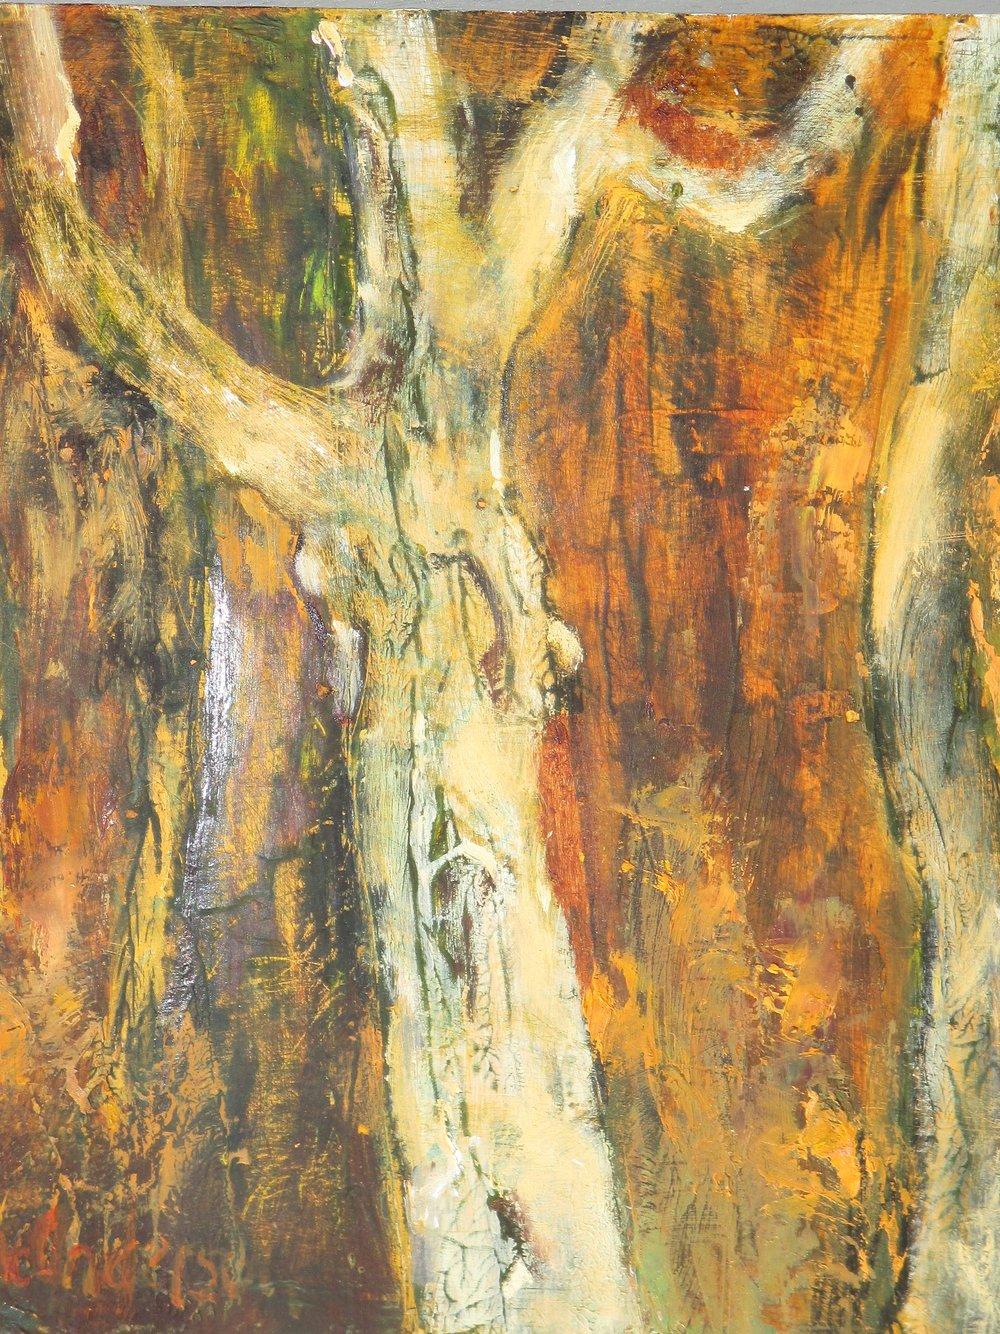 J Anderson Old-Trees-oil-on-board-20x20-june-Anderson1.jpg